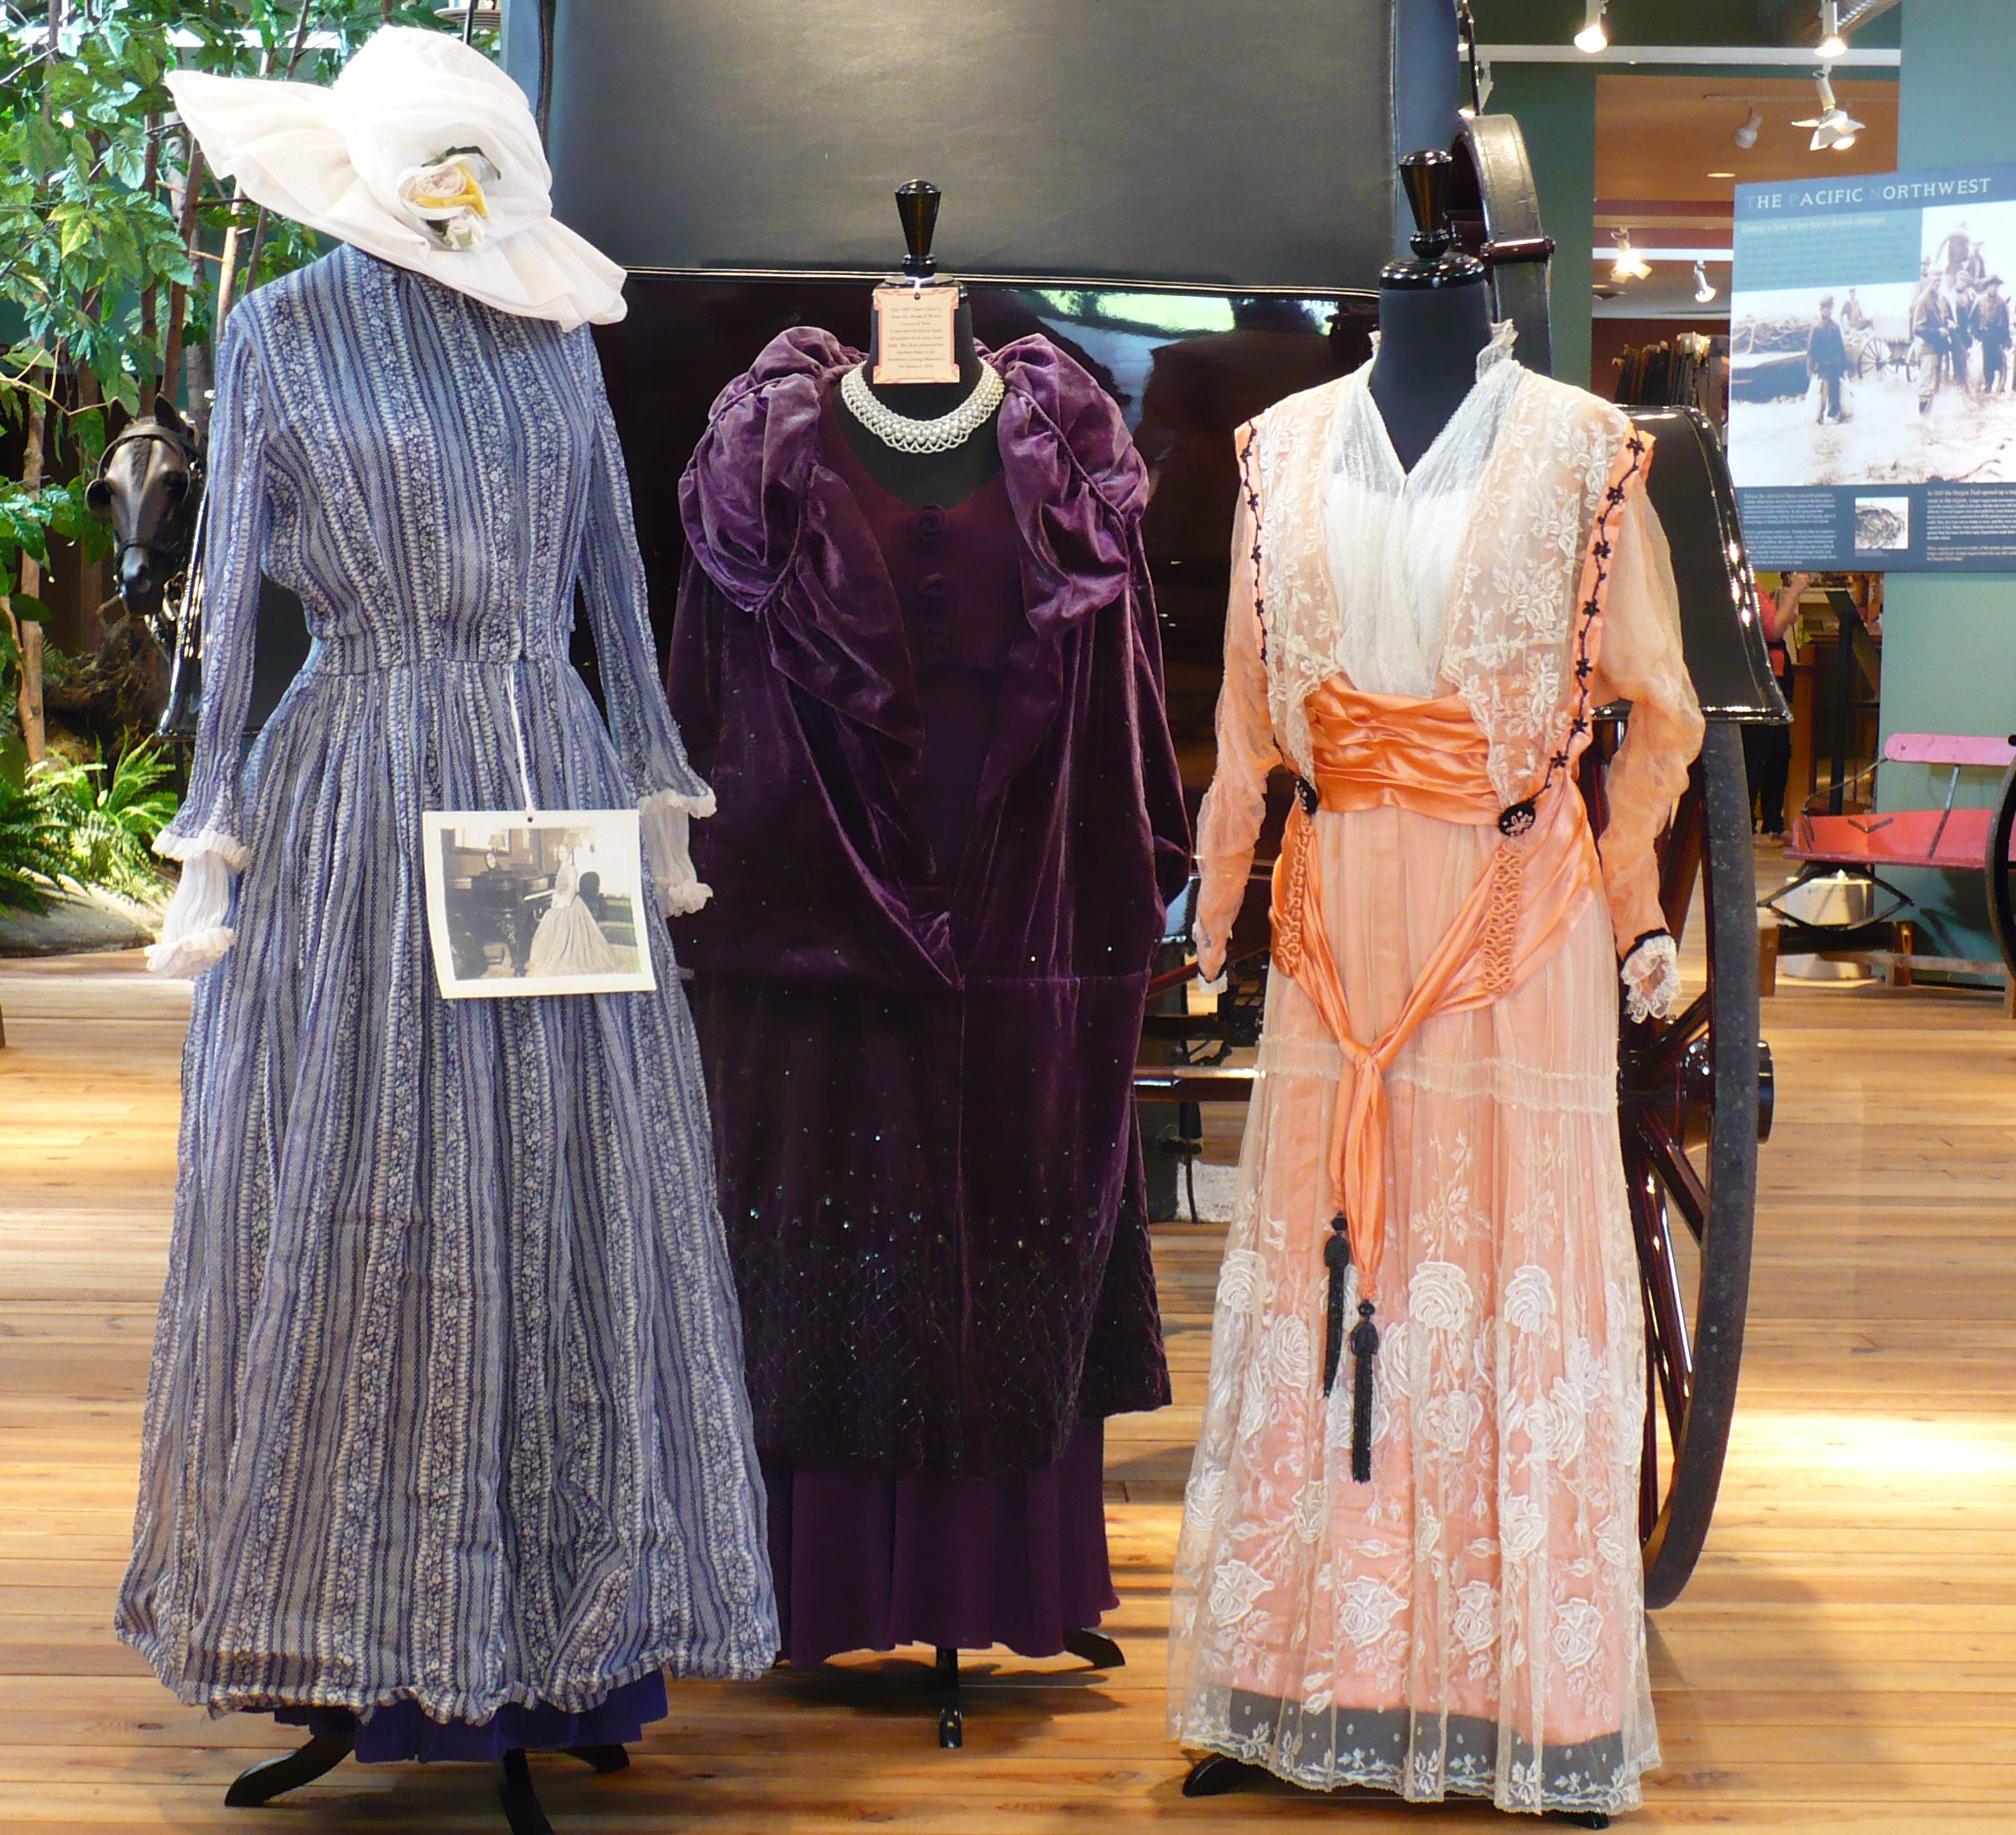 Turn of the century dresses